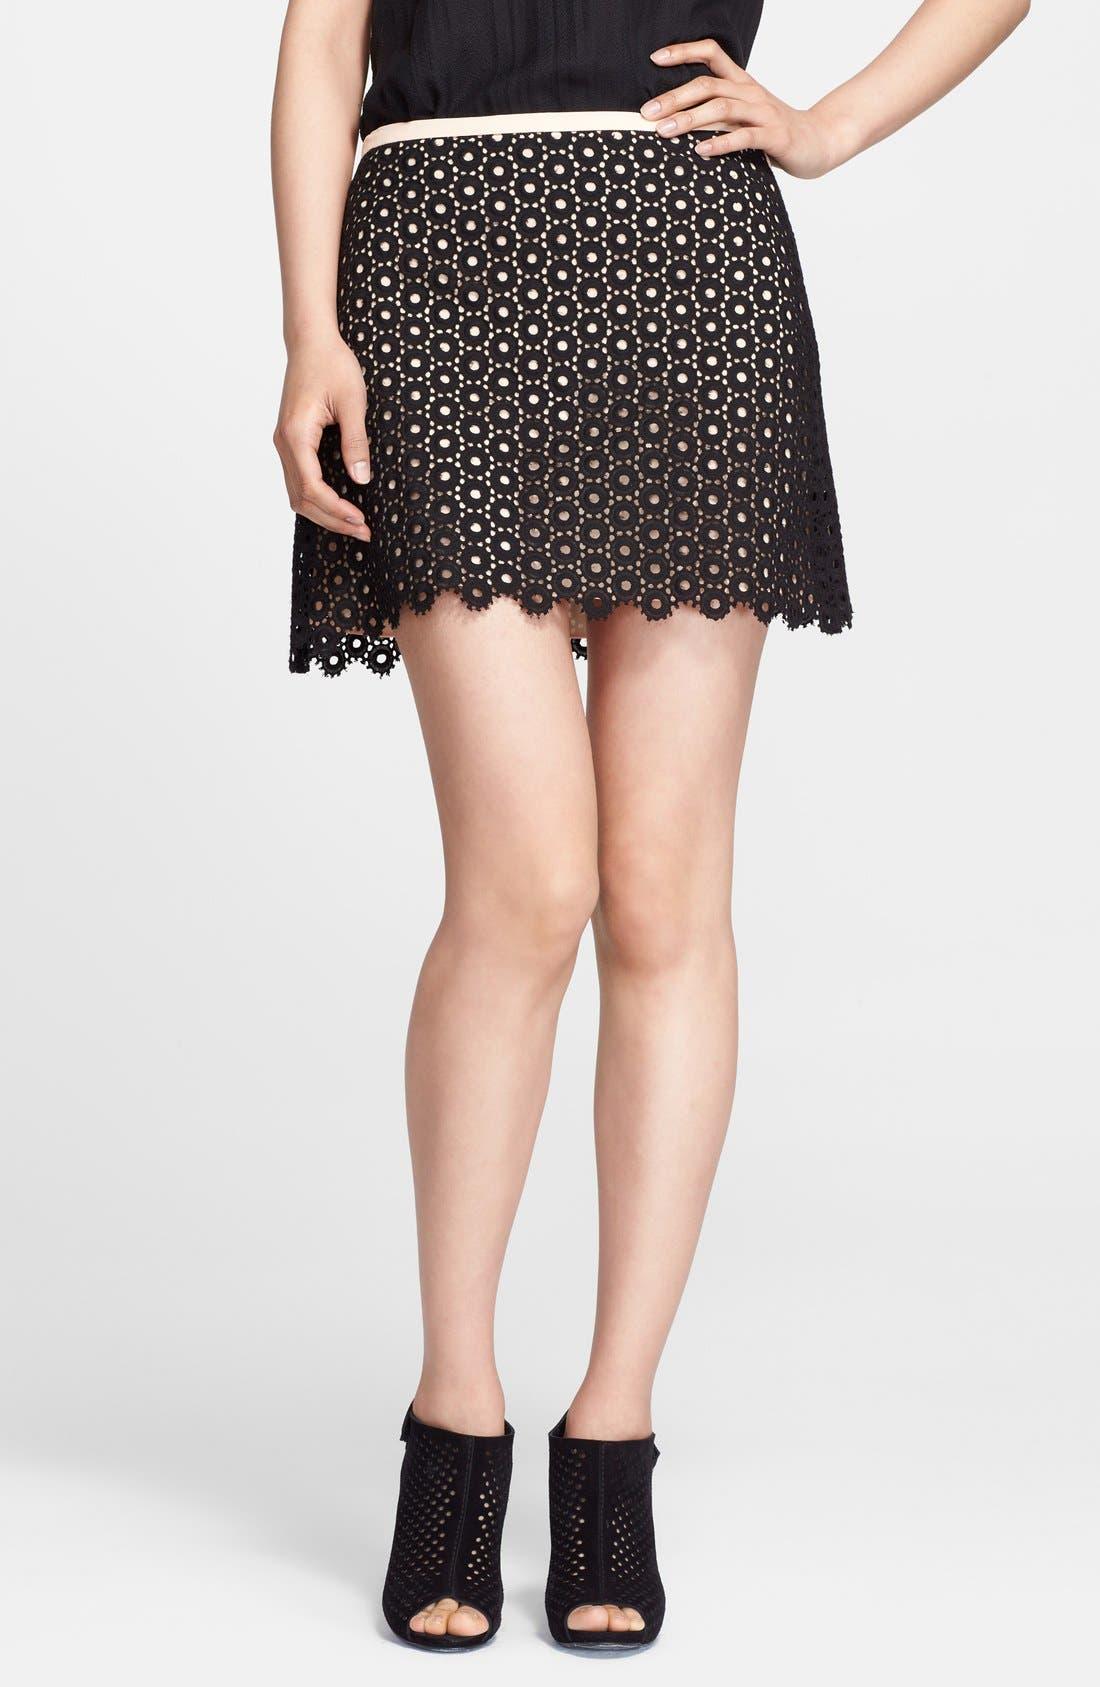 Alternate Image 1 Selected - Mcginn 'Rowan' Cotton Eyelet Skirt